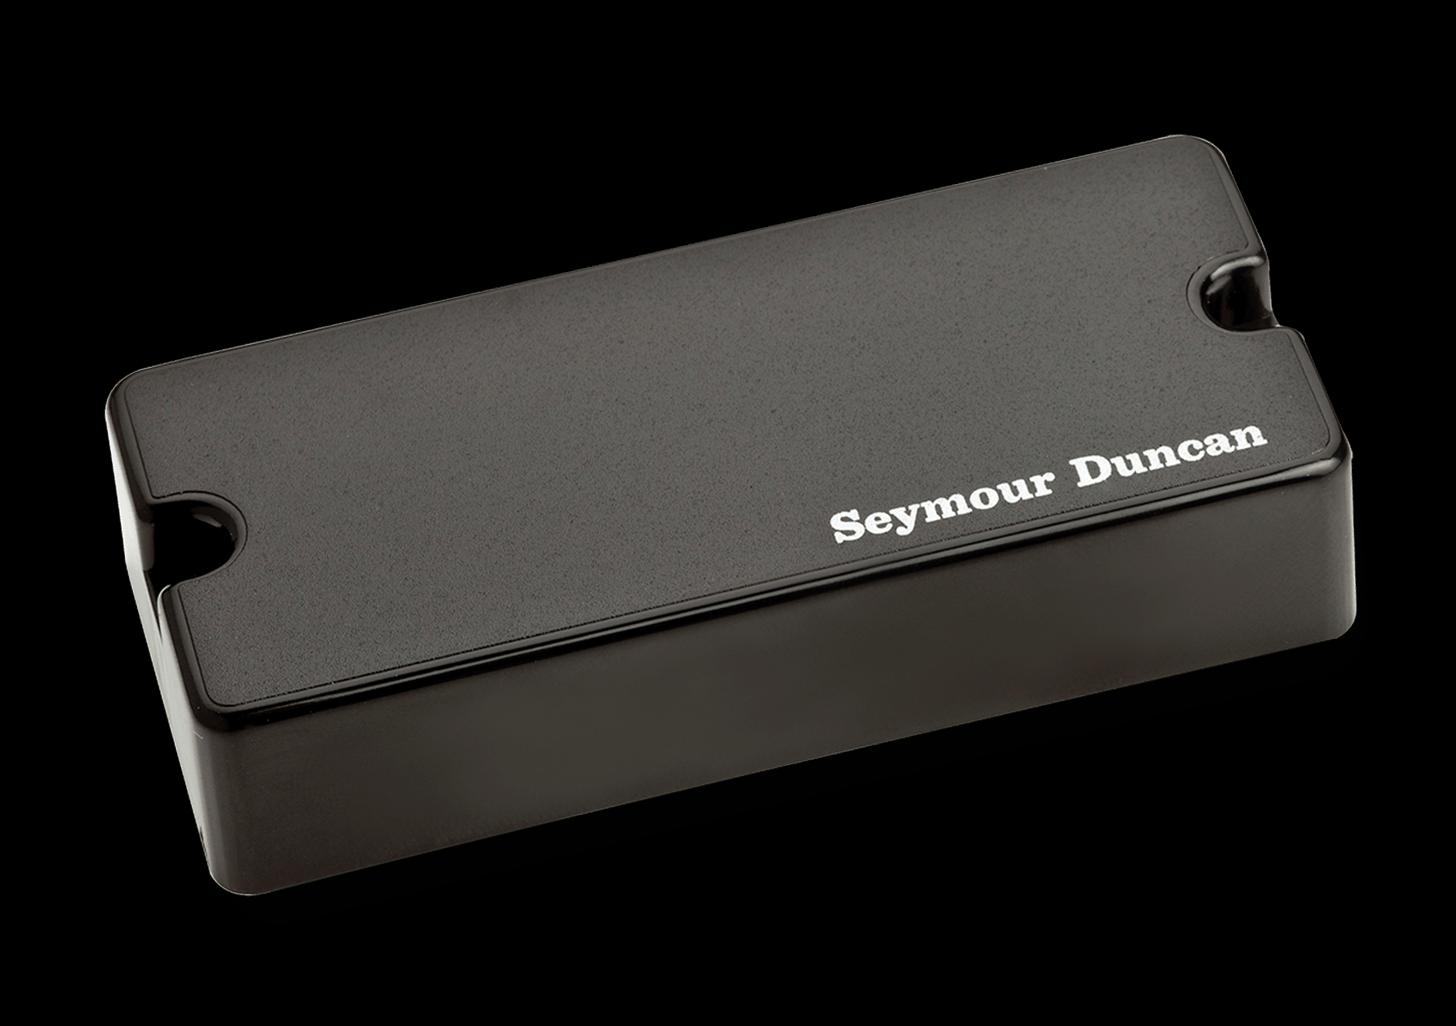 Seymour Duncan SSB-4B Four String Phase II Passive Bridge